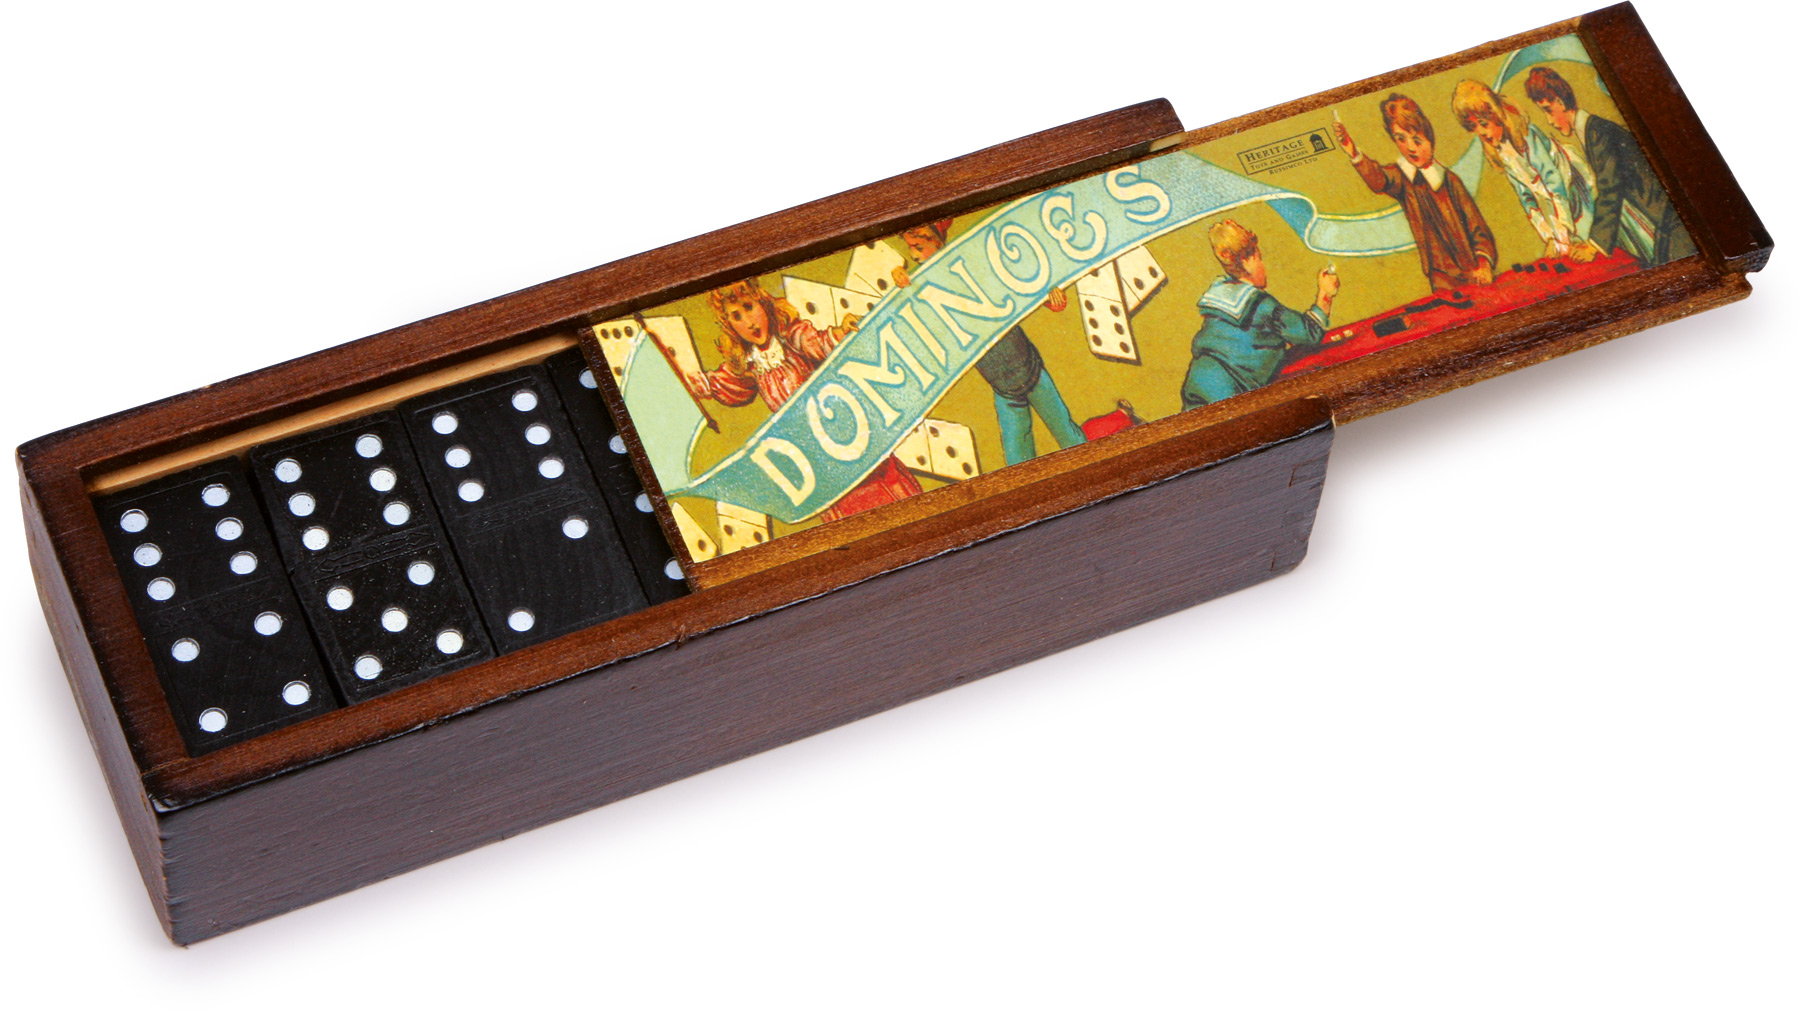 Small Foot Domino nostalgie 2 ks